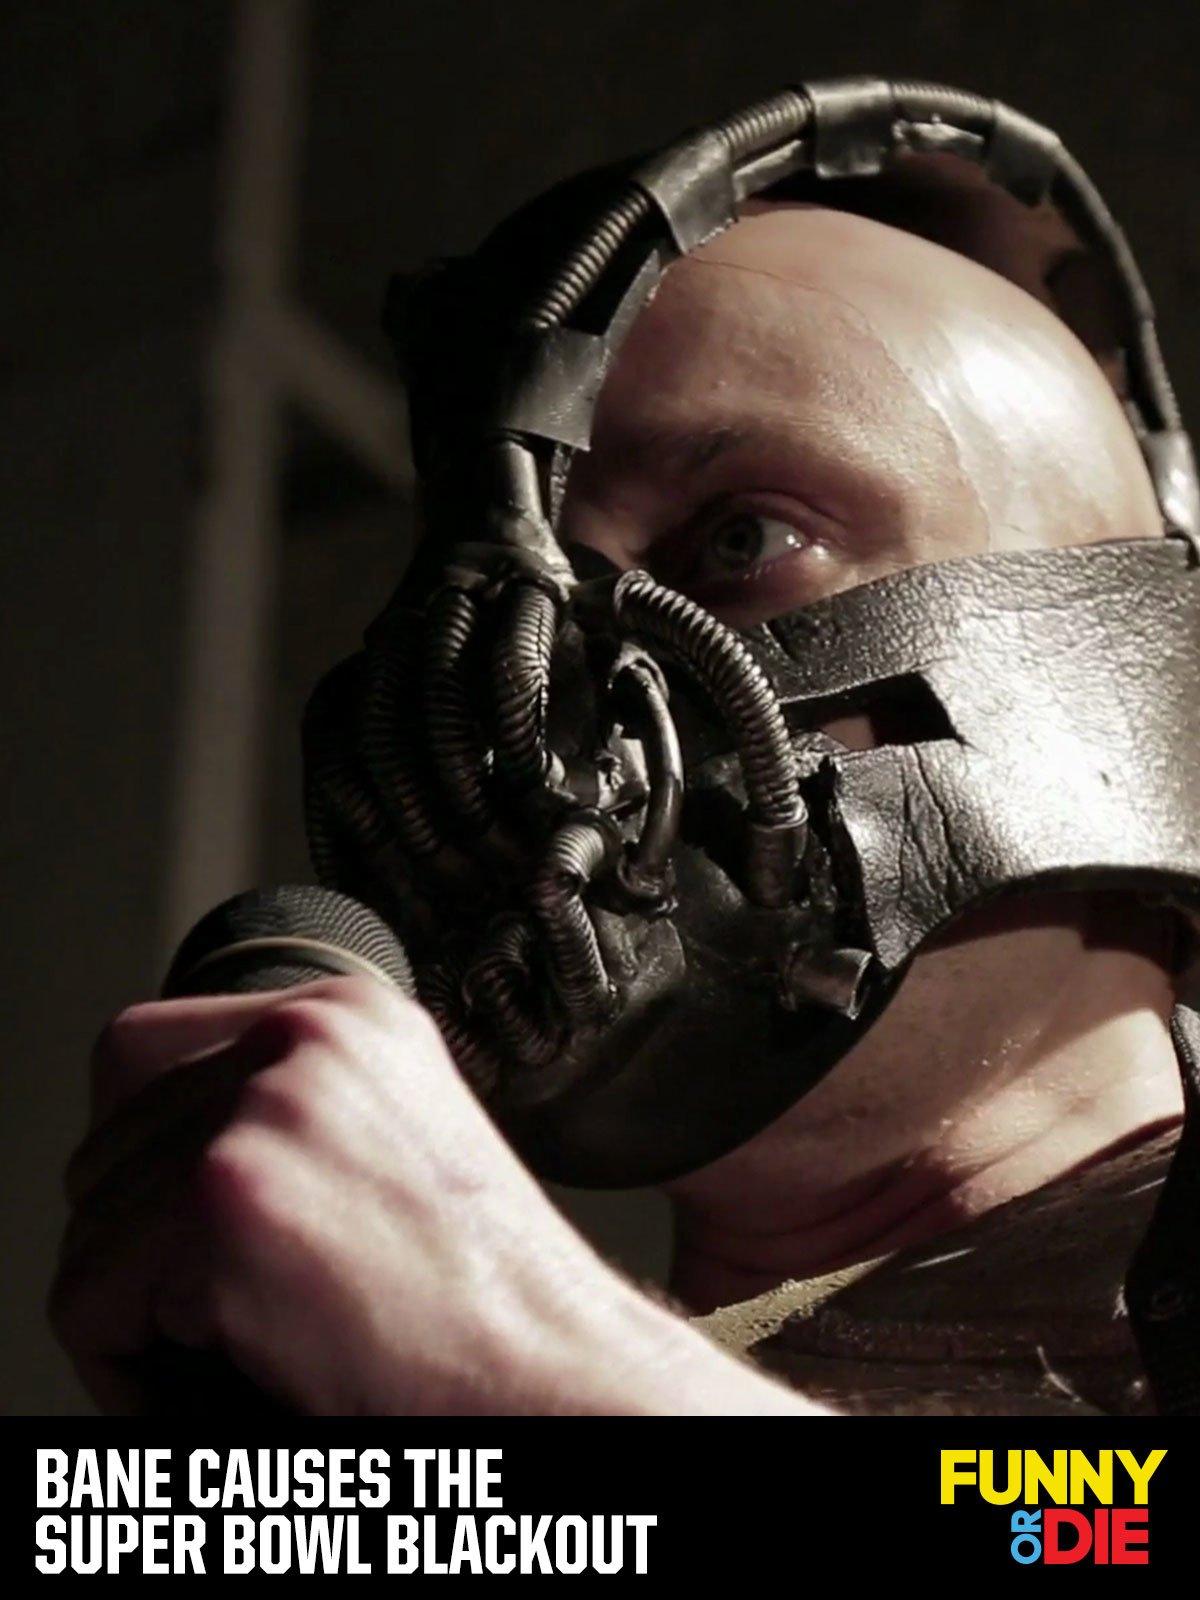 Bane Causes the Super Bowl Blackout with Chris Kattan